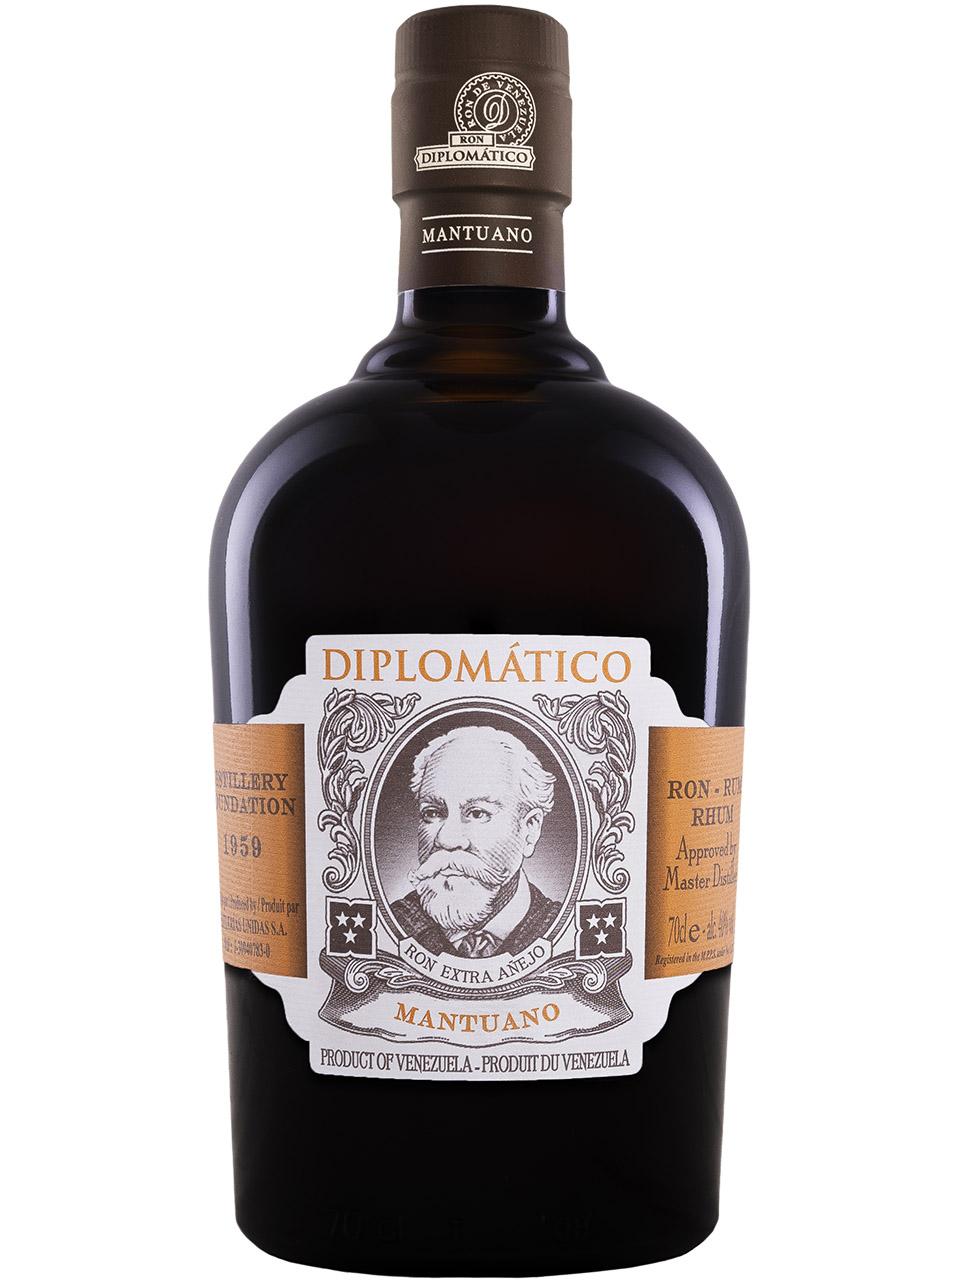 Diplomatico Mantuano 8YO Rum